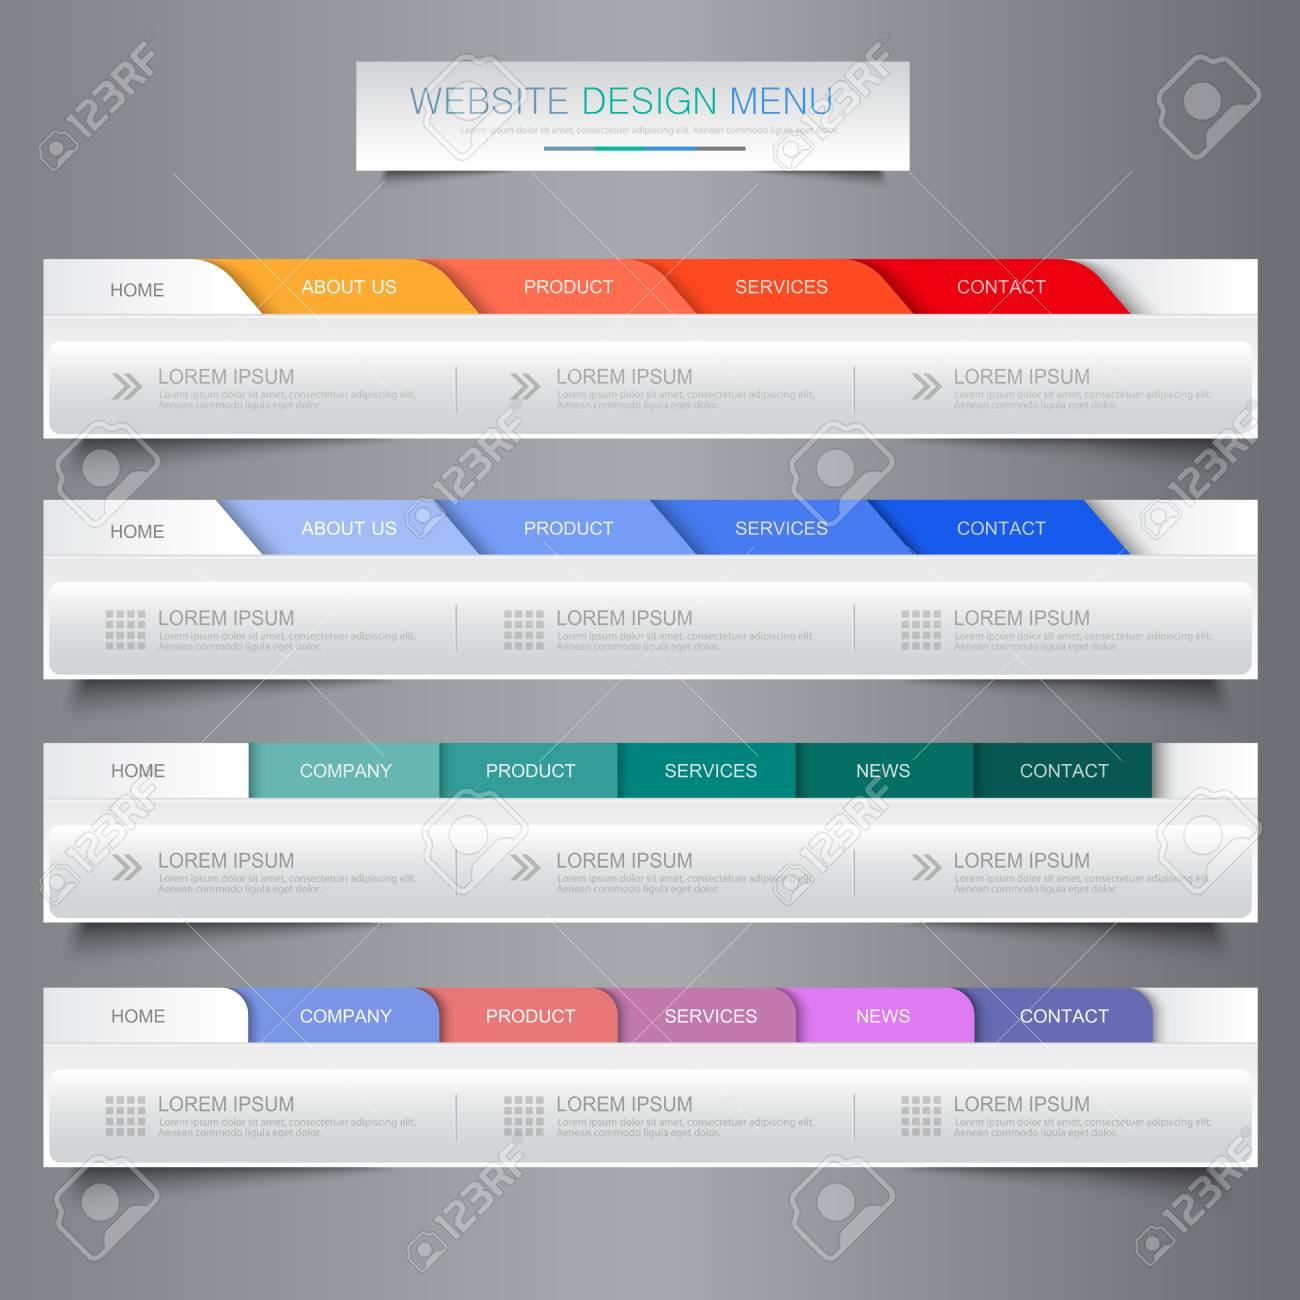 Web Site Design Menu Navigation Elements With Icons Set: Navigation ...